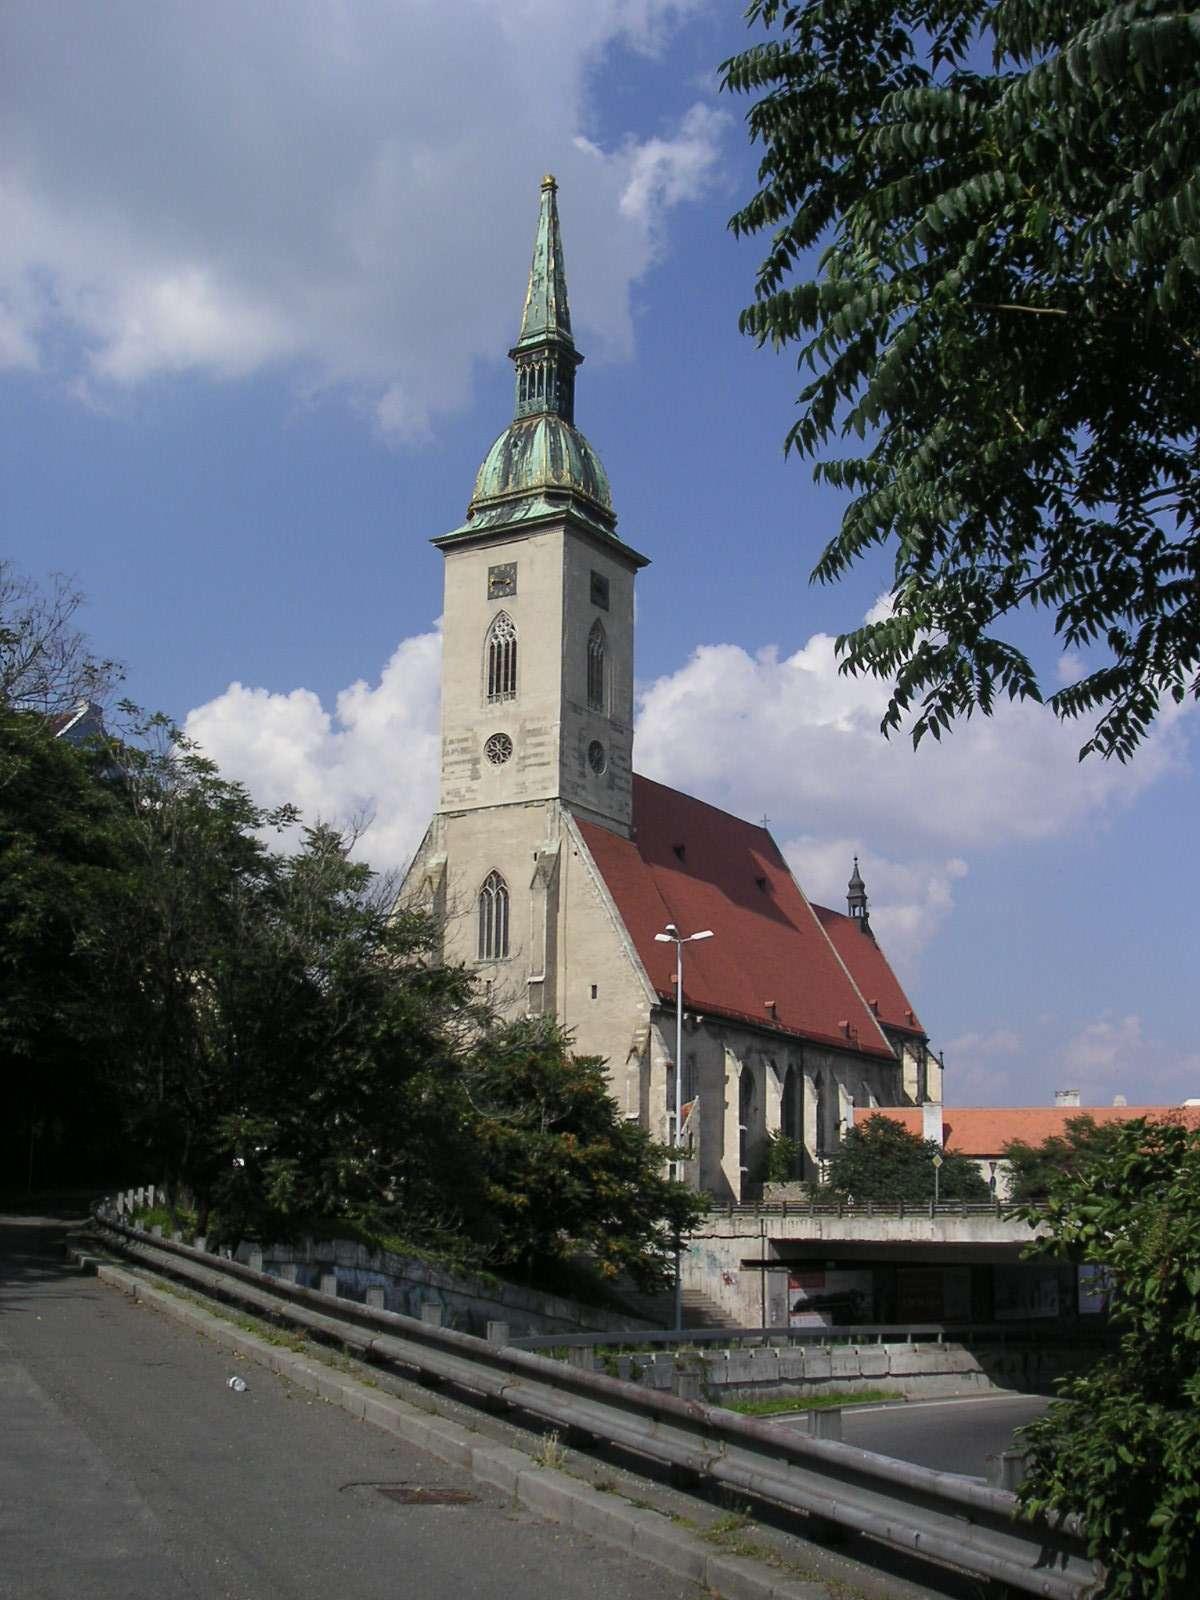 http://upload.wikimedia.org/wikipedia/commons/6/67/Bratislava-Dom-sv-Martina.jpg